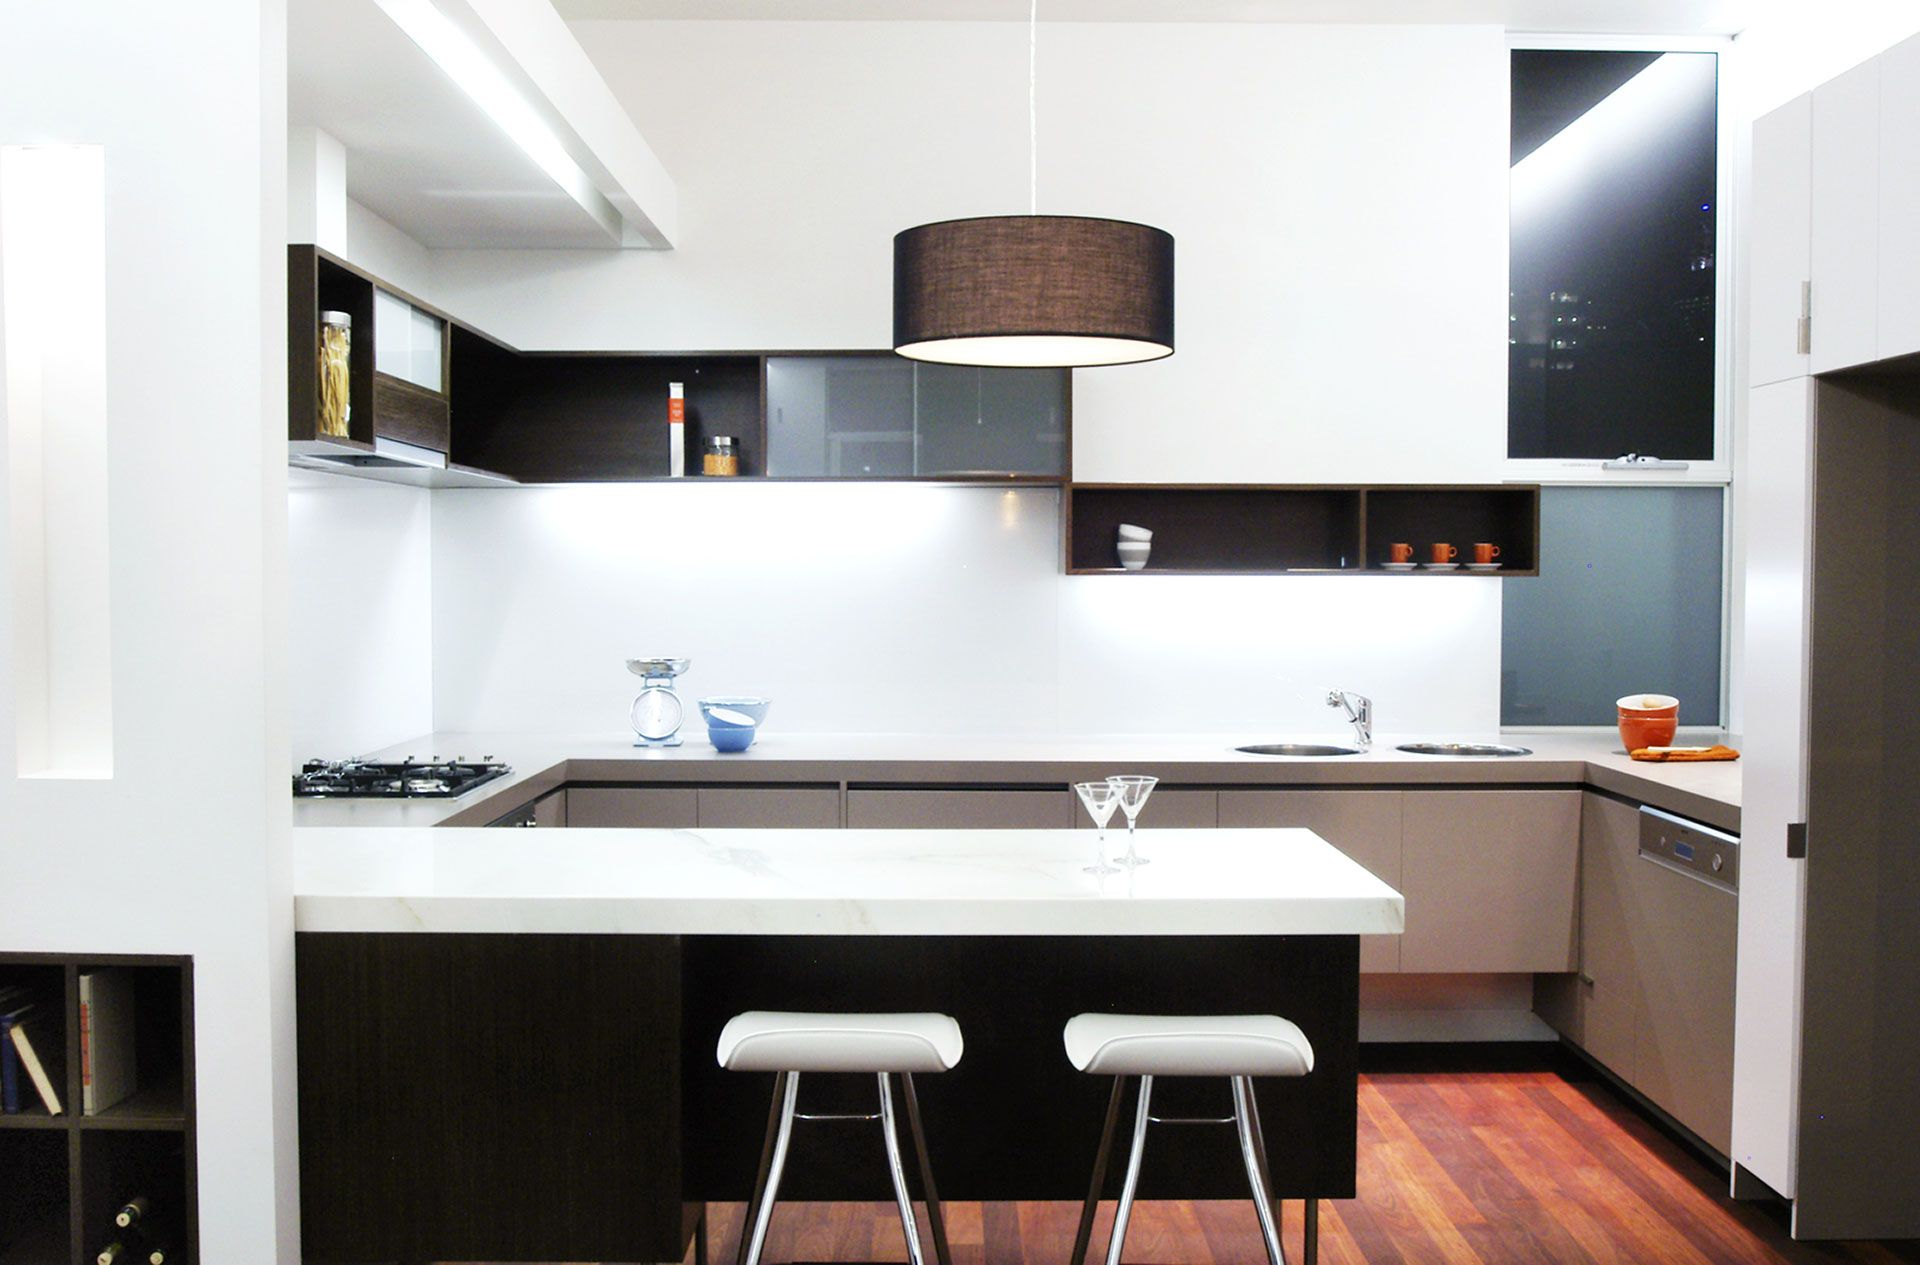 Bdlc brunswick 05 kitchen wr